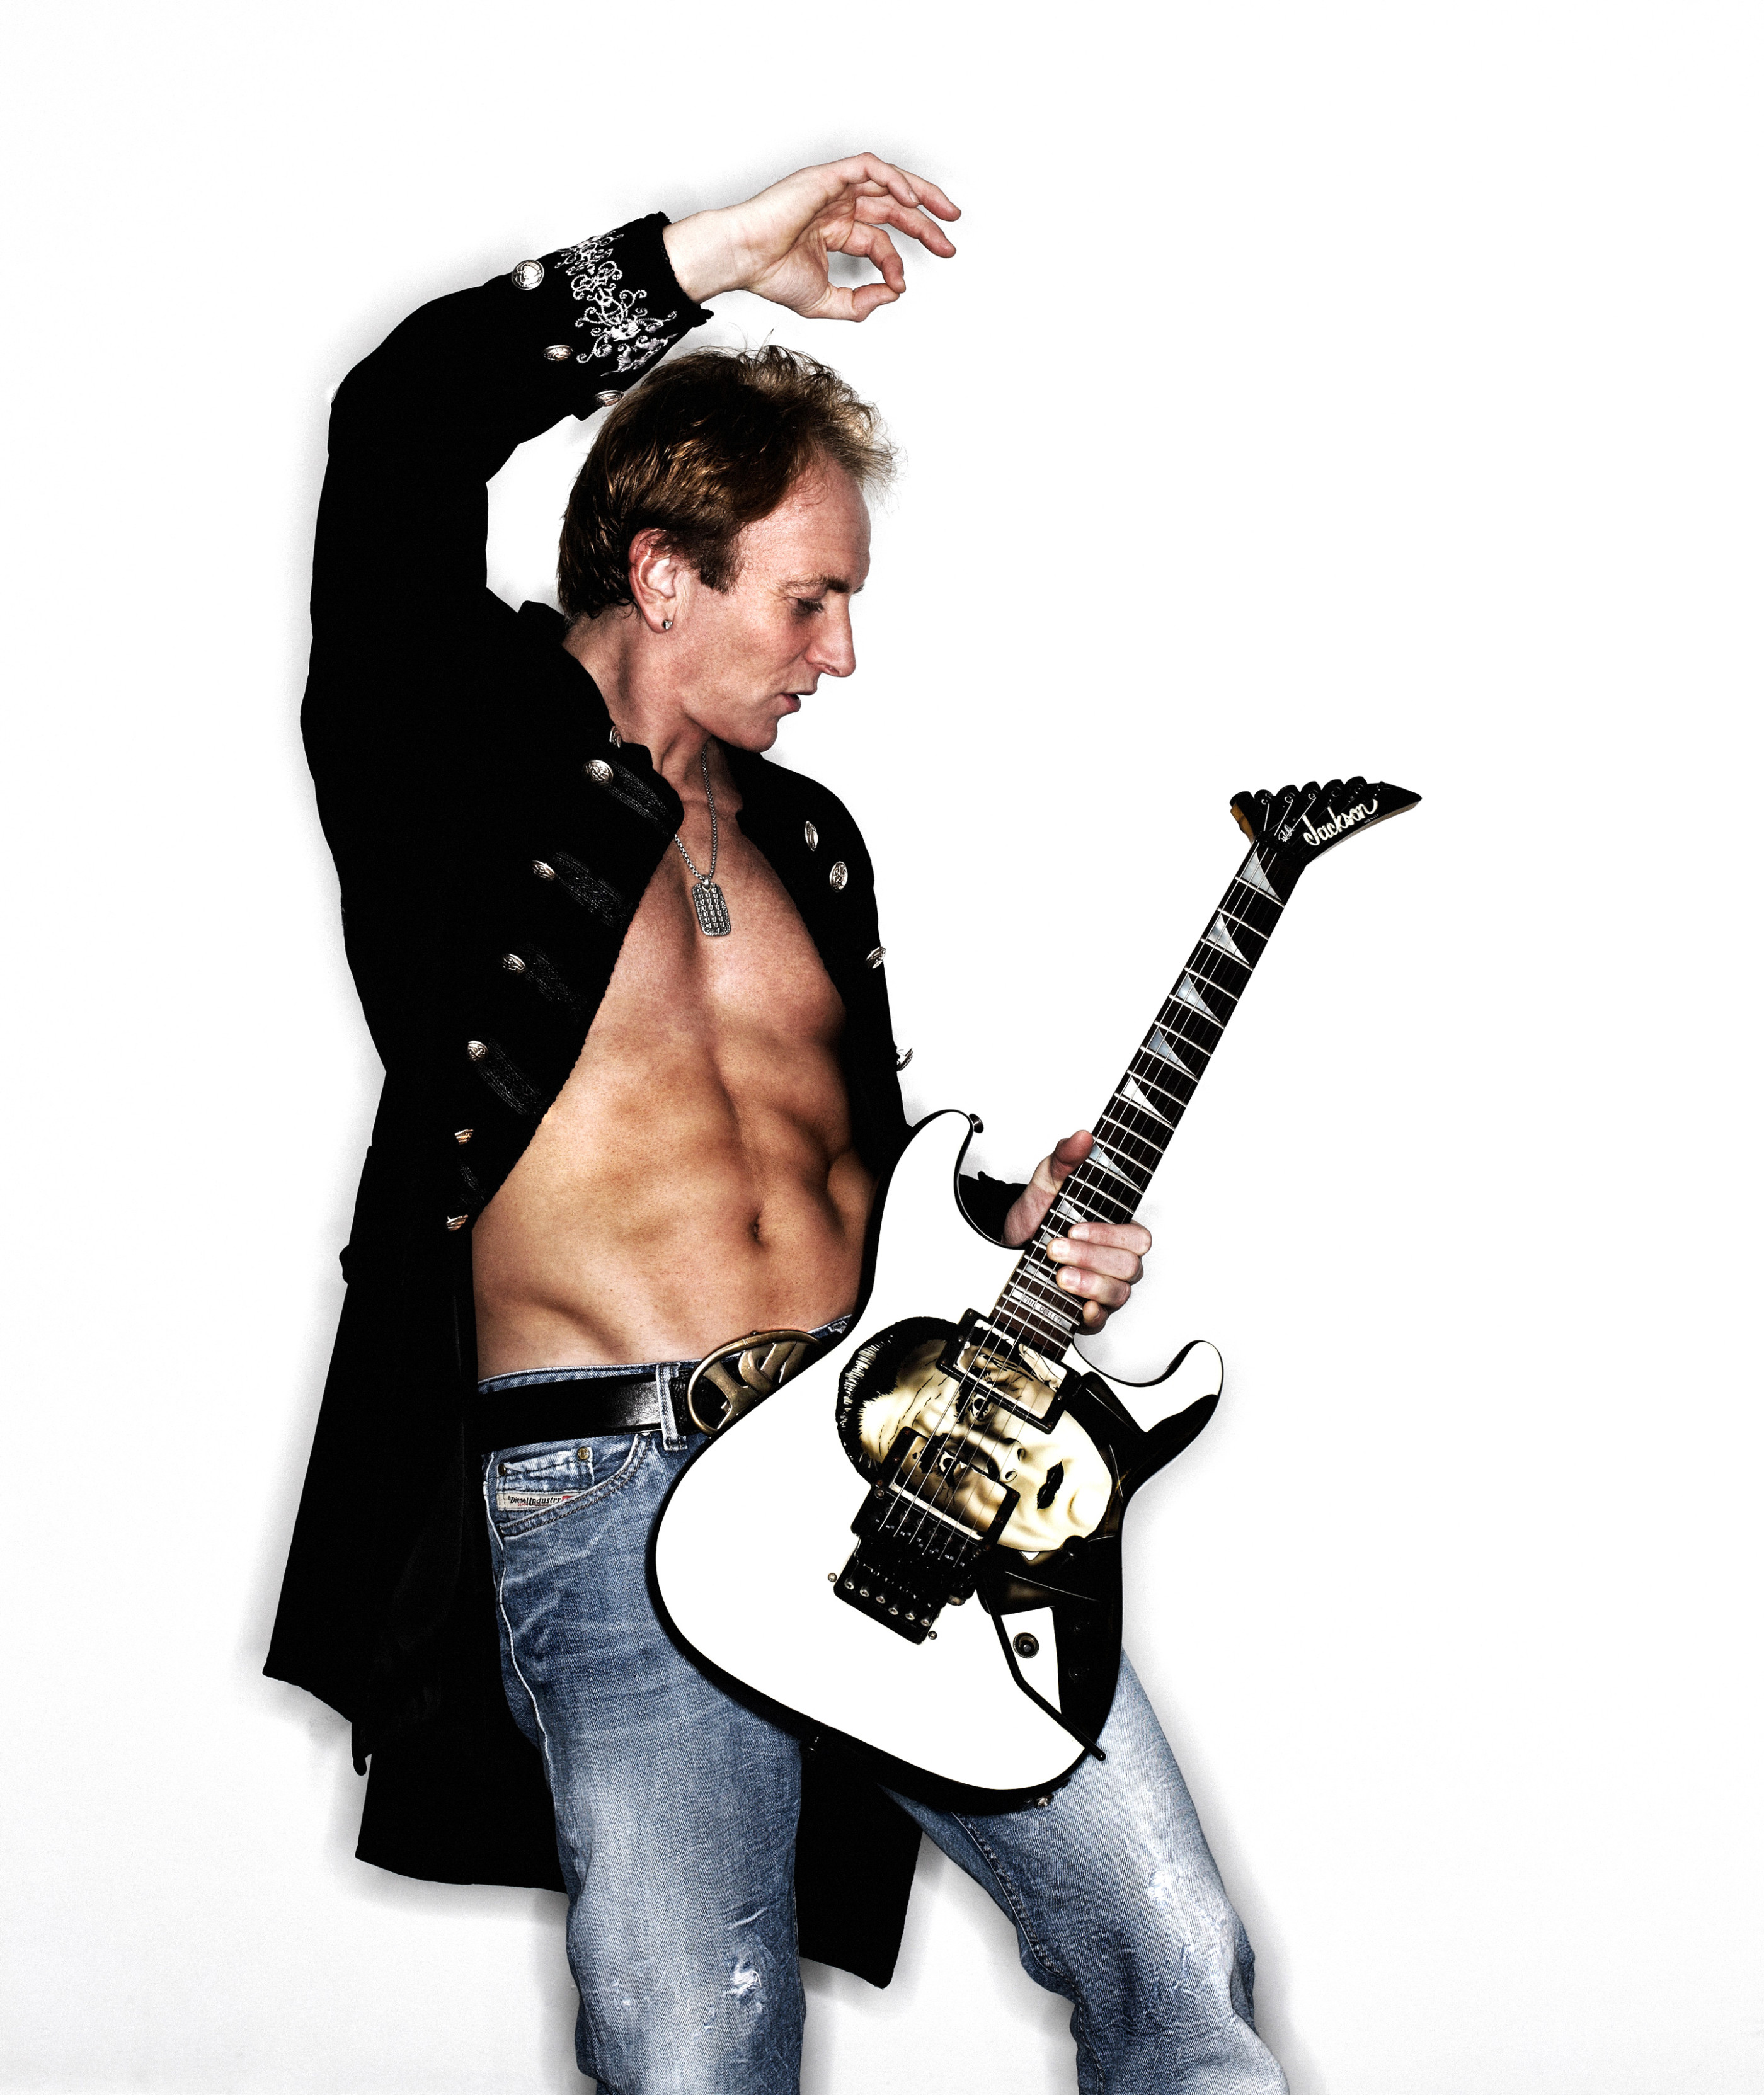 Phil Collen Jackson Bela Lugosi Guitar